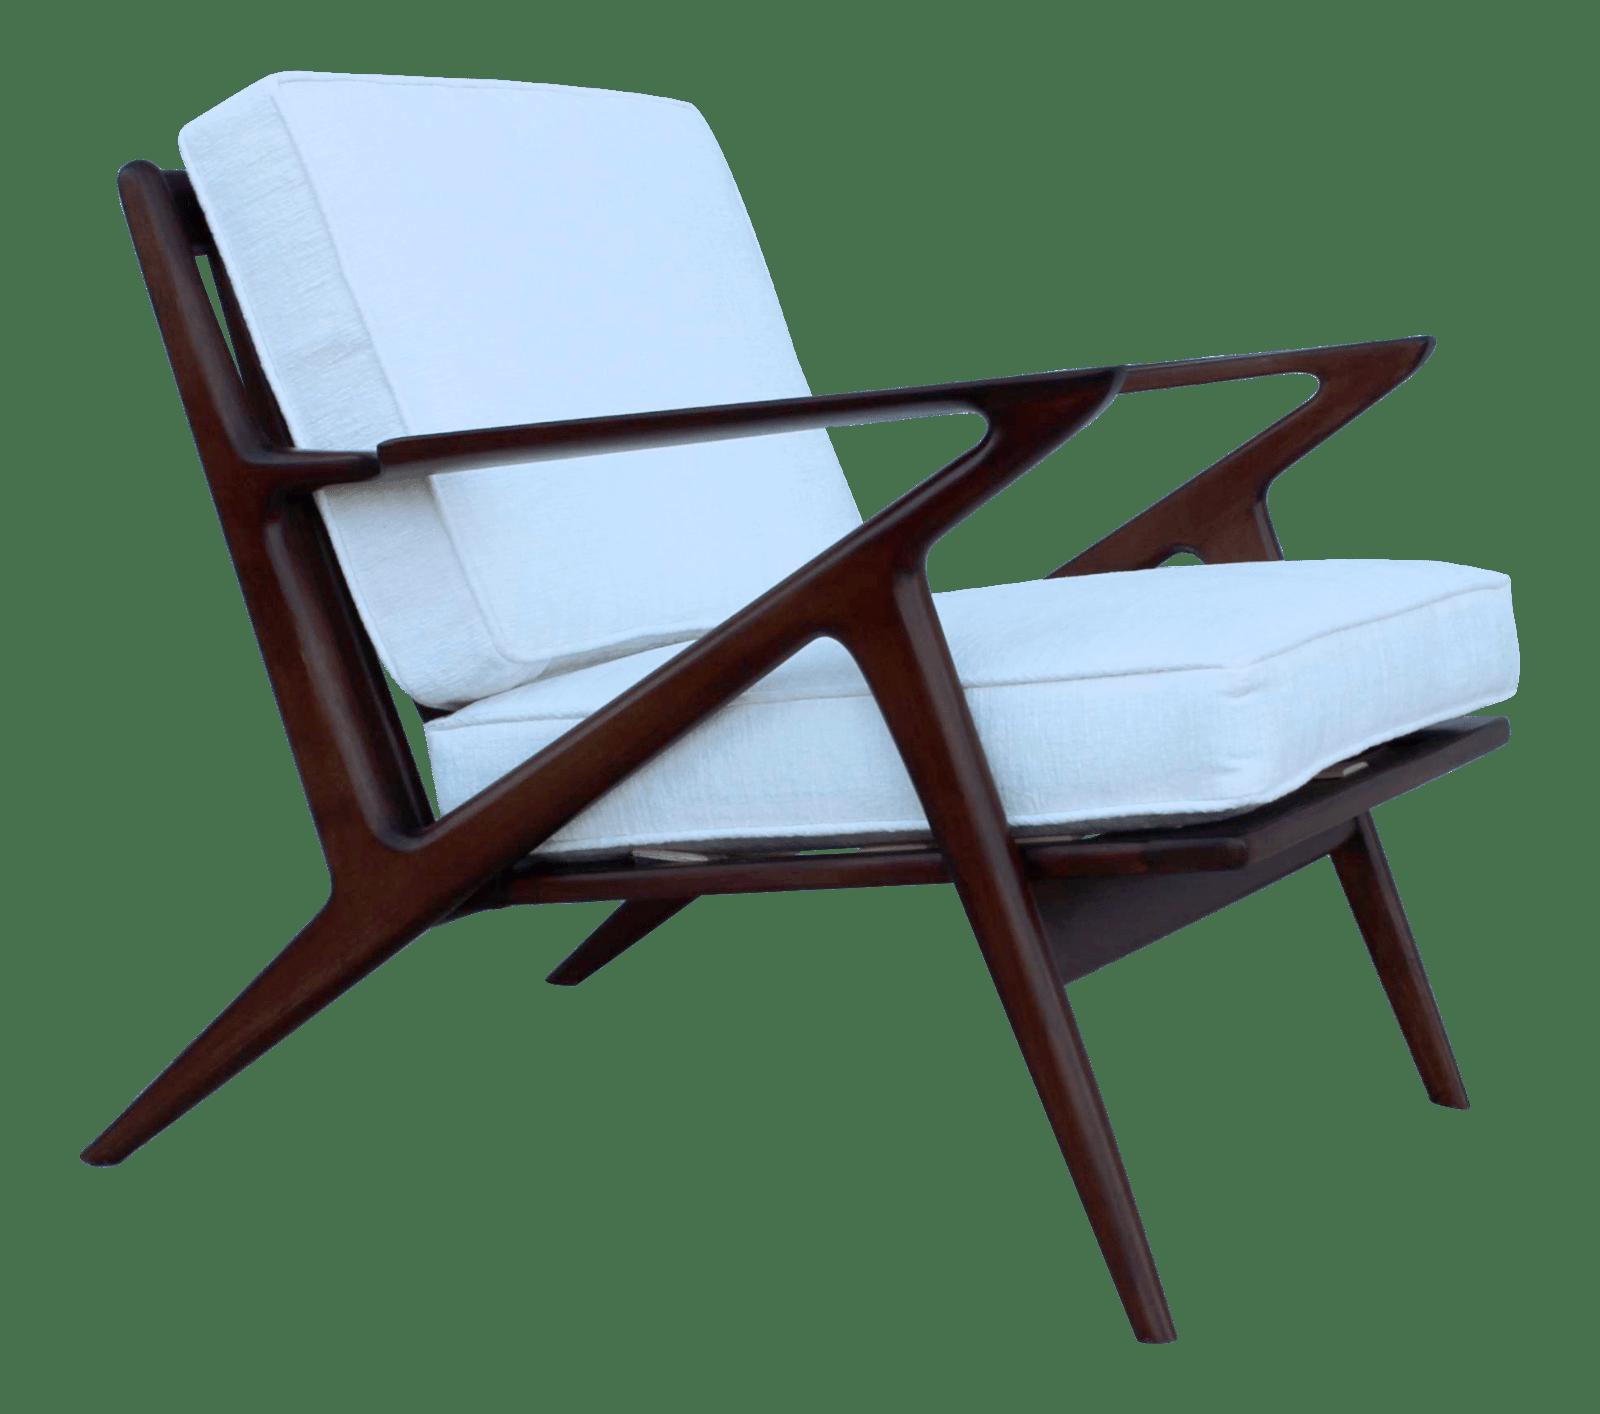 folding z chair classic event covers vintage 1950s poul jensen danish chairish for sale